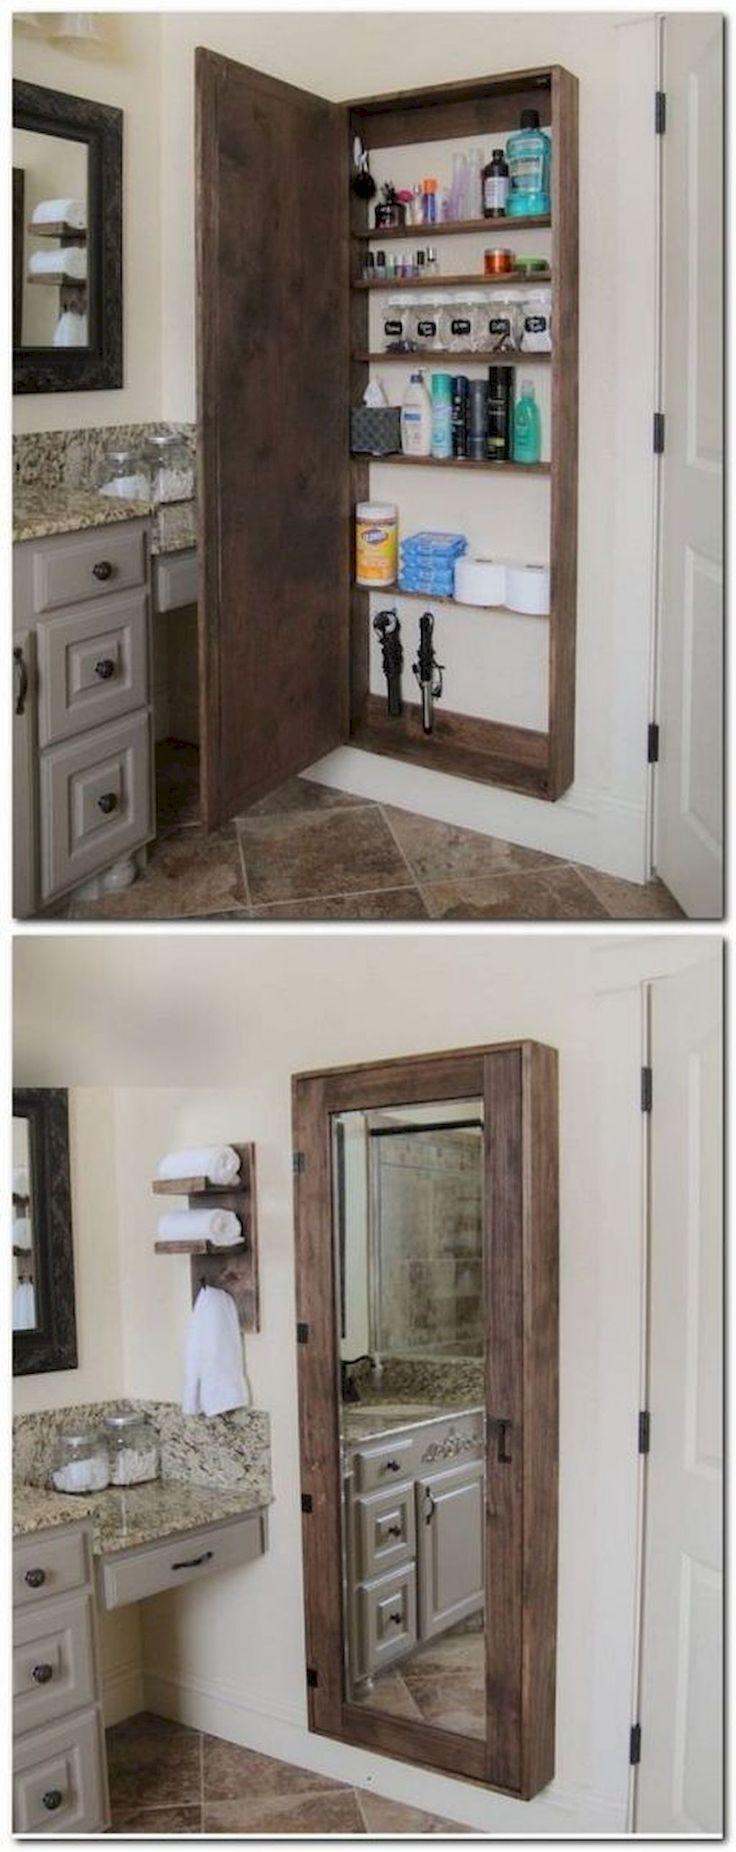 Adorable 75 Farmhouse Studio Apartment Bathroom Remodel Ideas https://homeastern.com/2017/10/05/75-farmhouse-studio-apartment-bathroom-remodel-ideas/